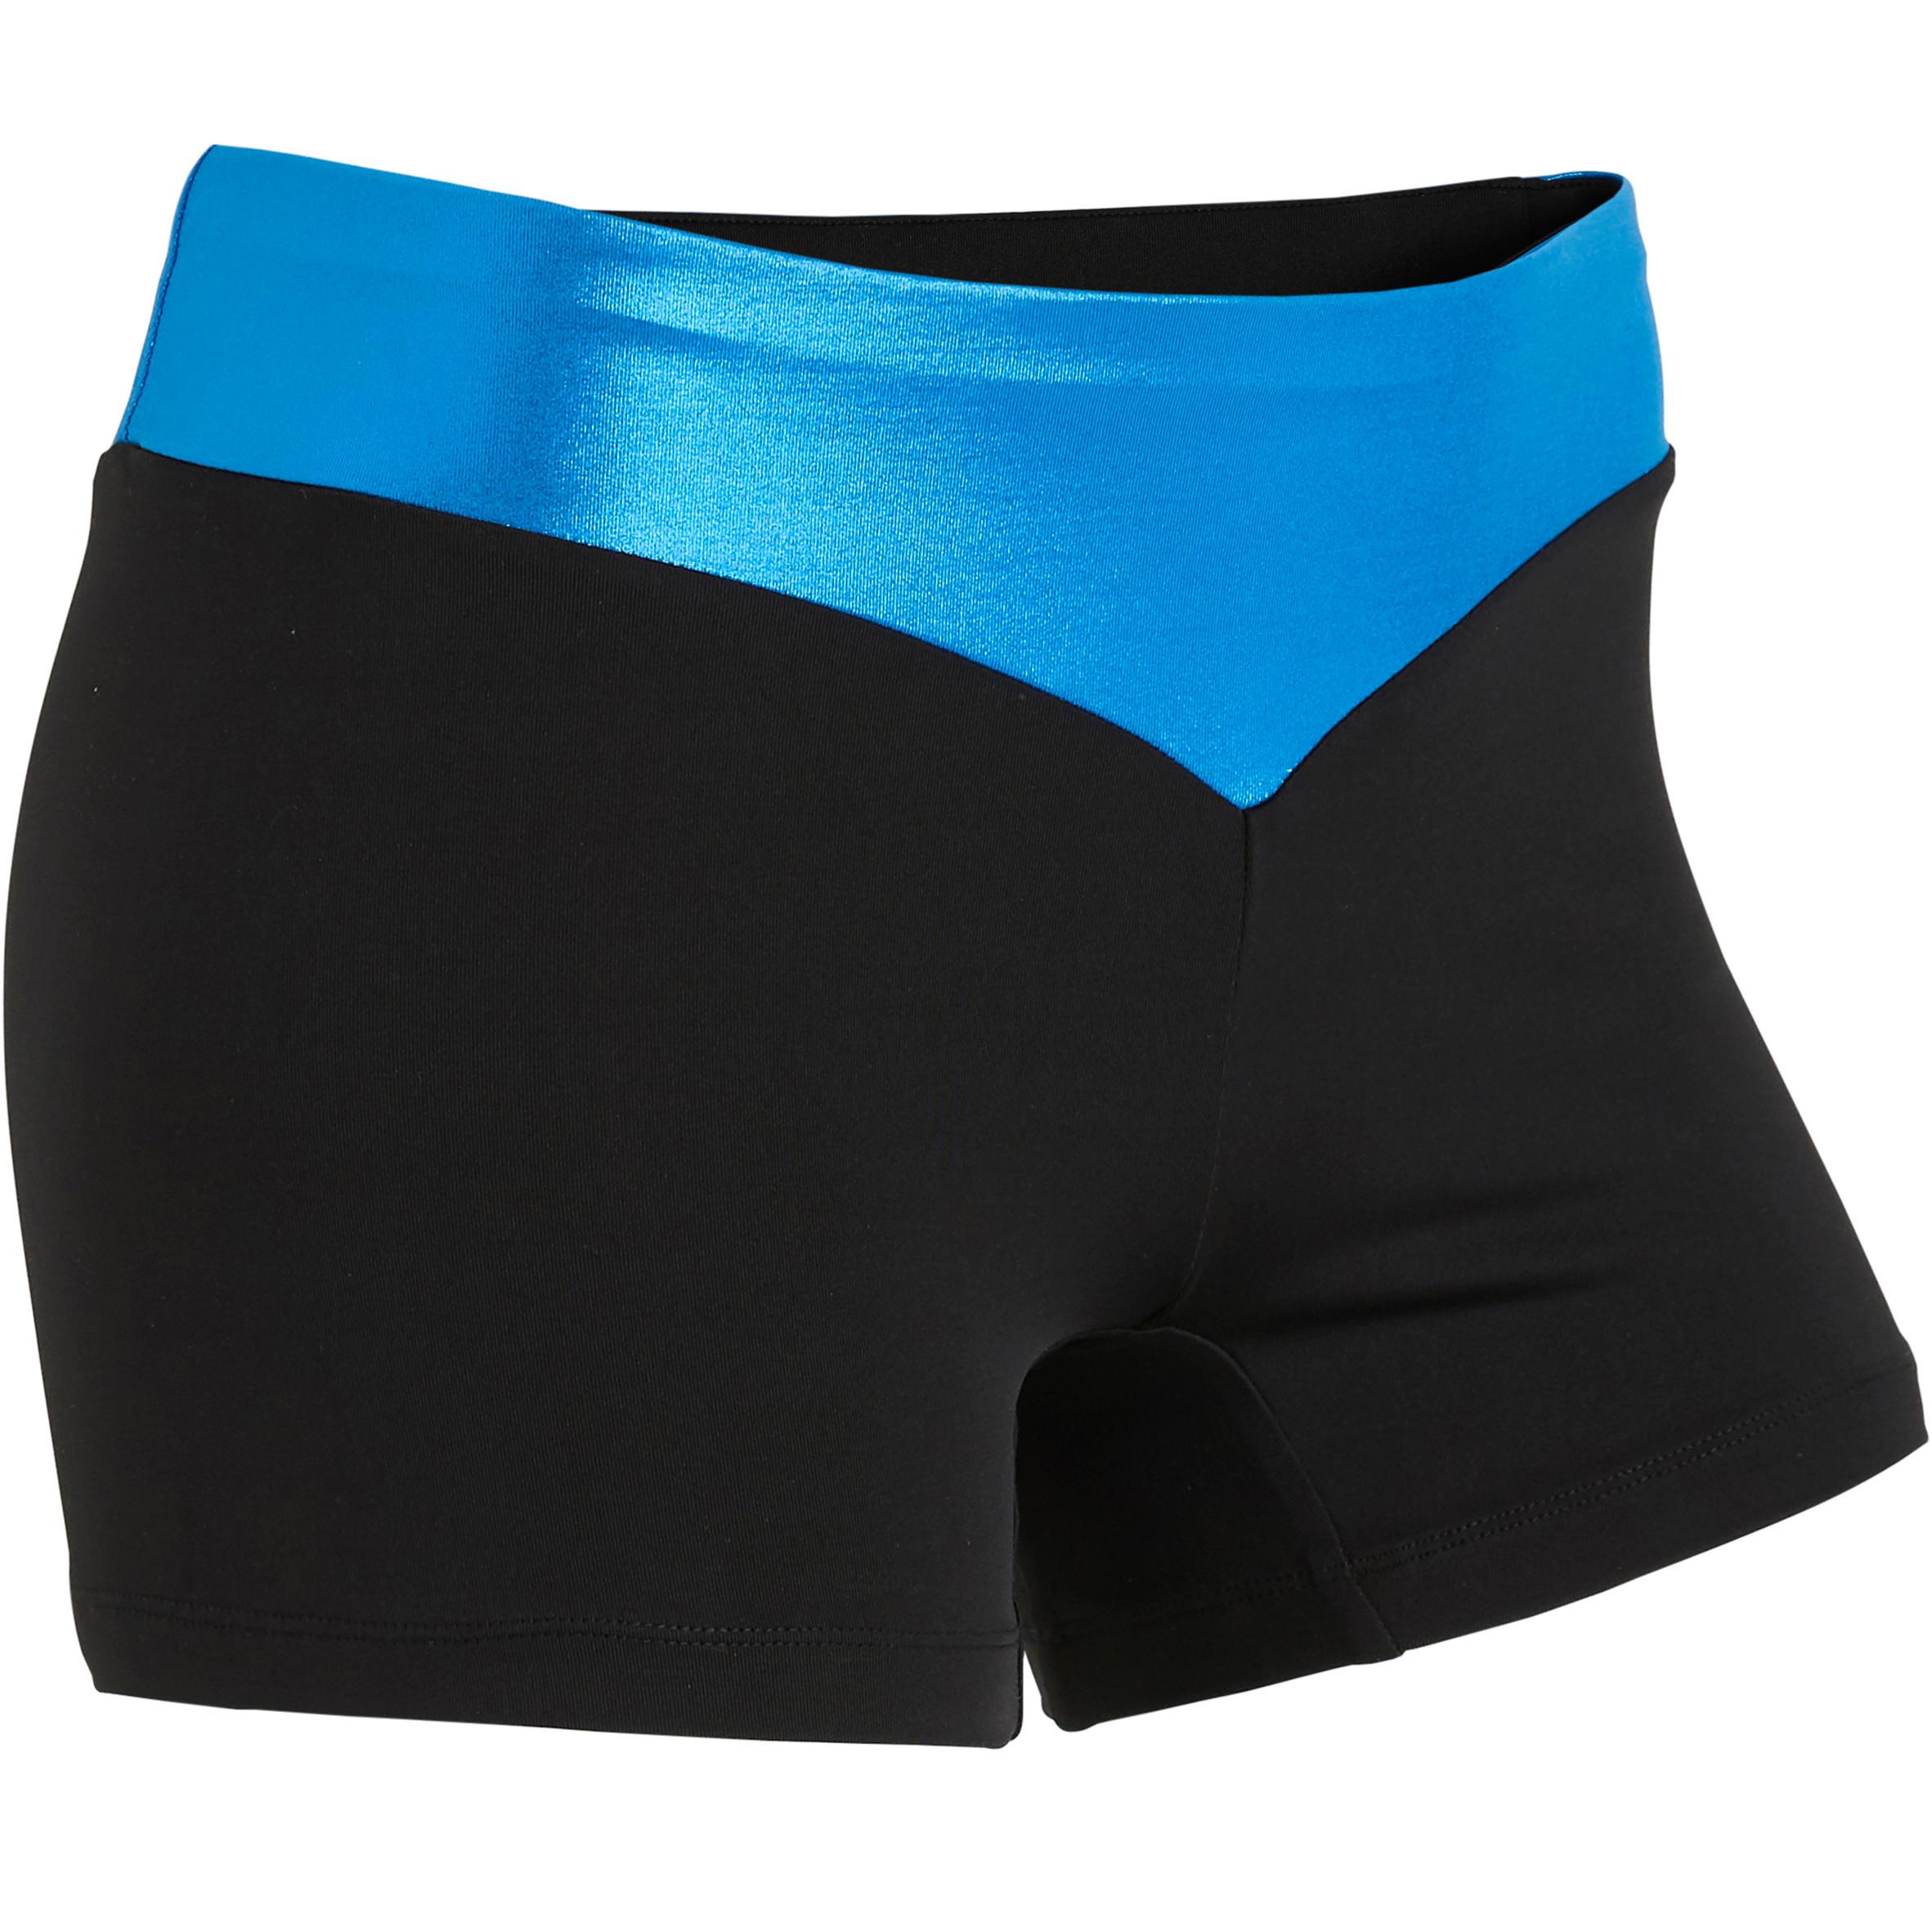 Short bleu 500 gymnastique artistique féminine domyos